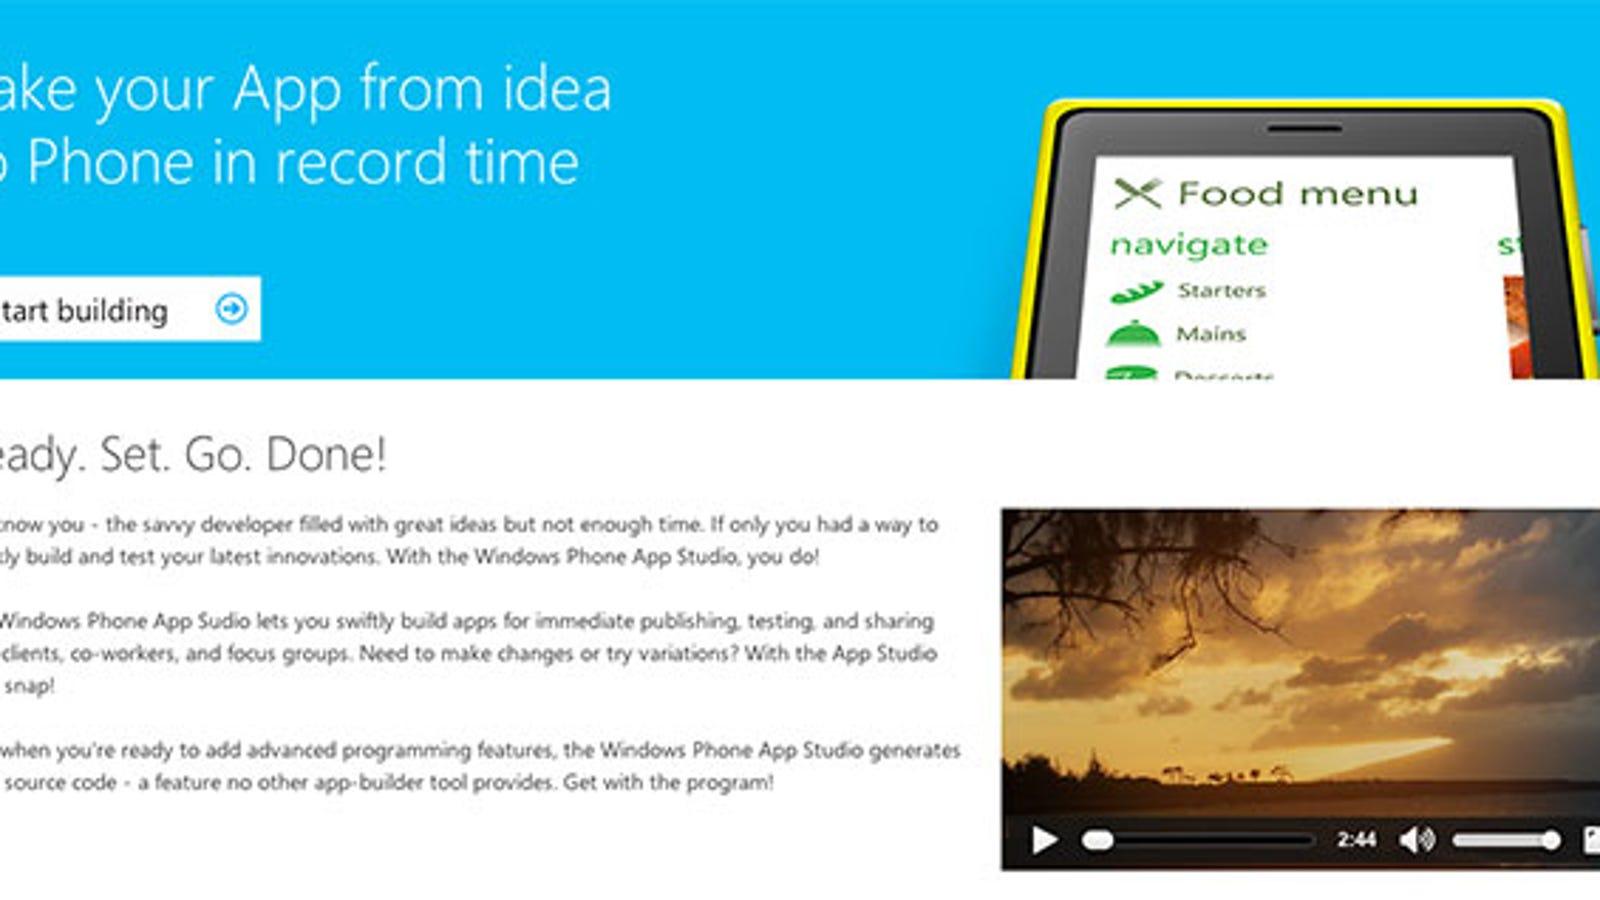 Windows Phone App Studio Makes App Creation as Easy as Drag